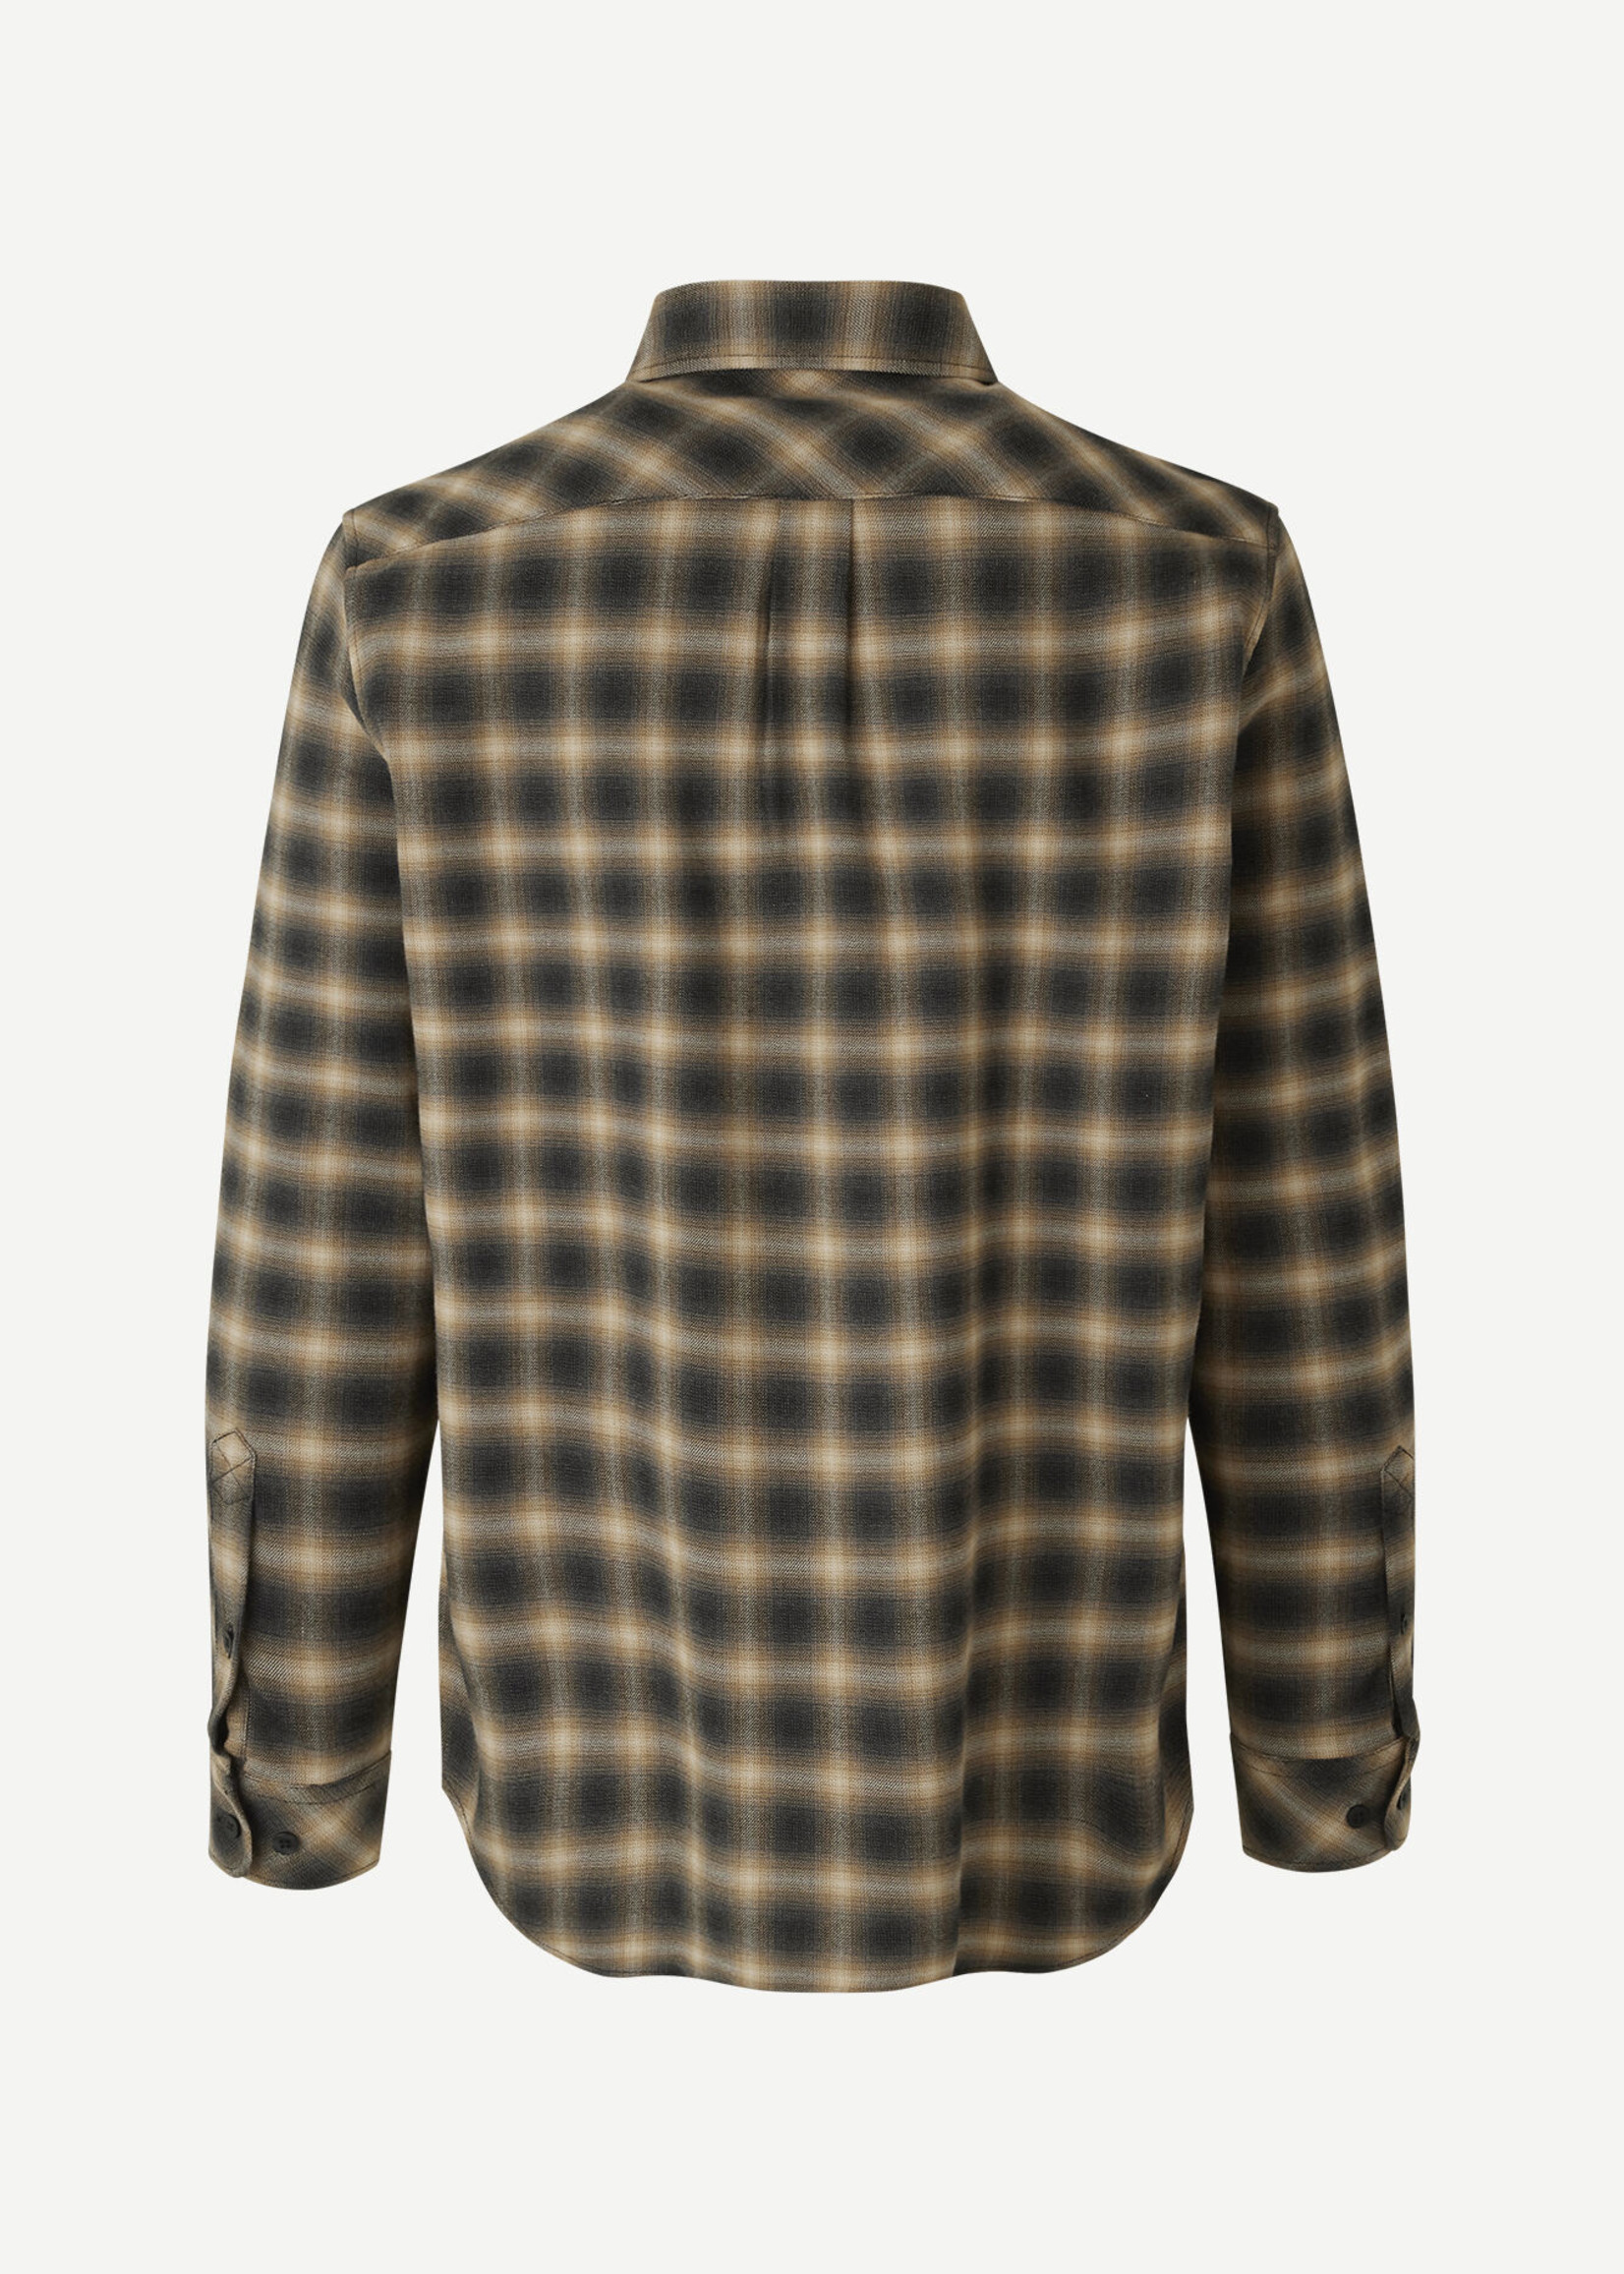 Samsoe & Samsoe Liam NP Shirt 14086